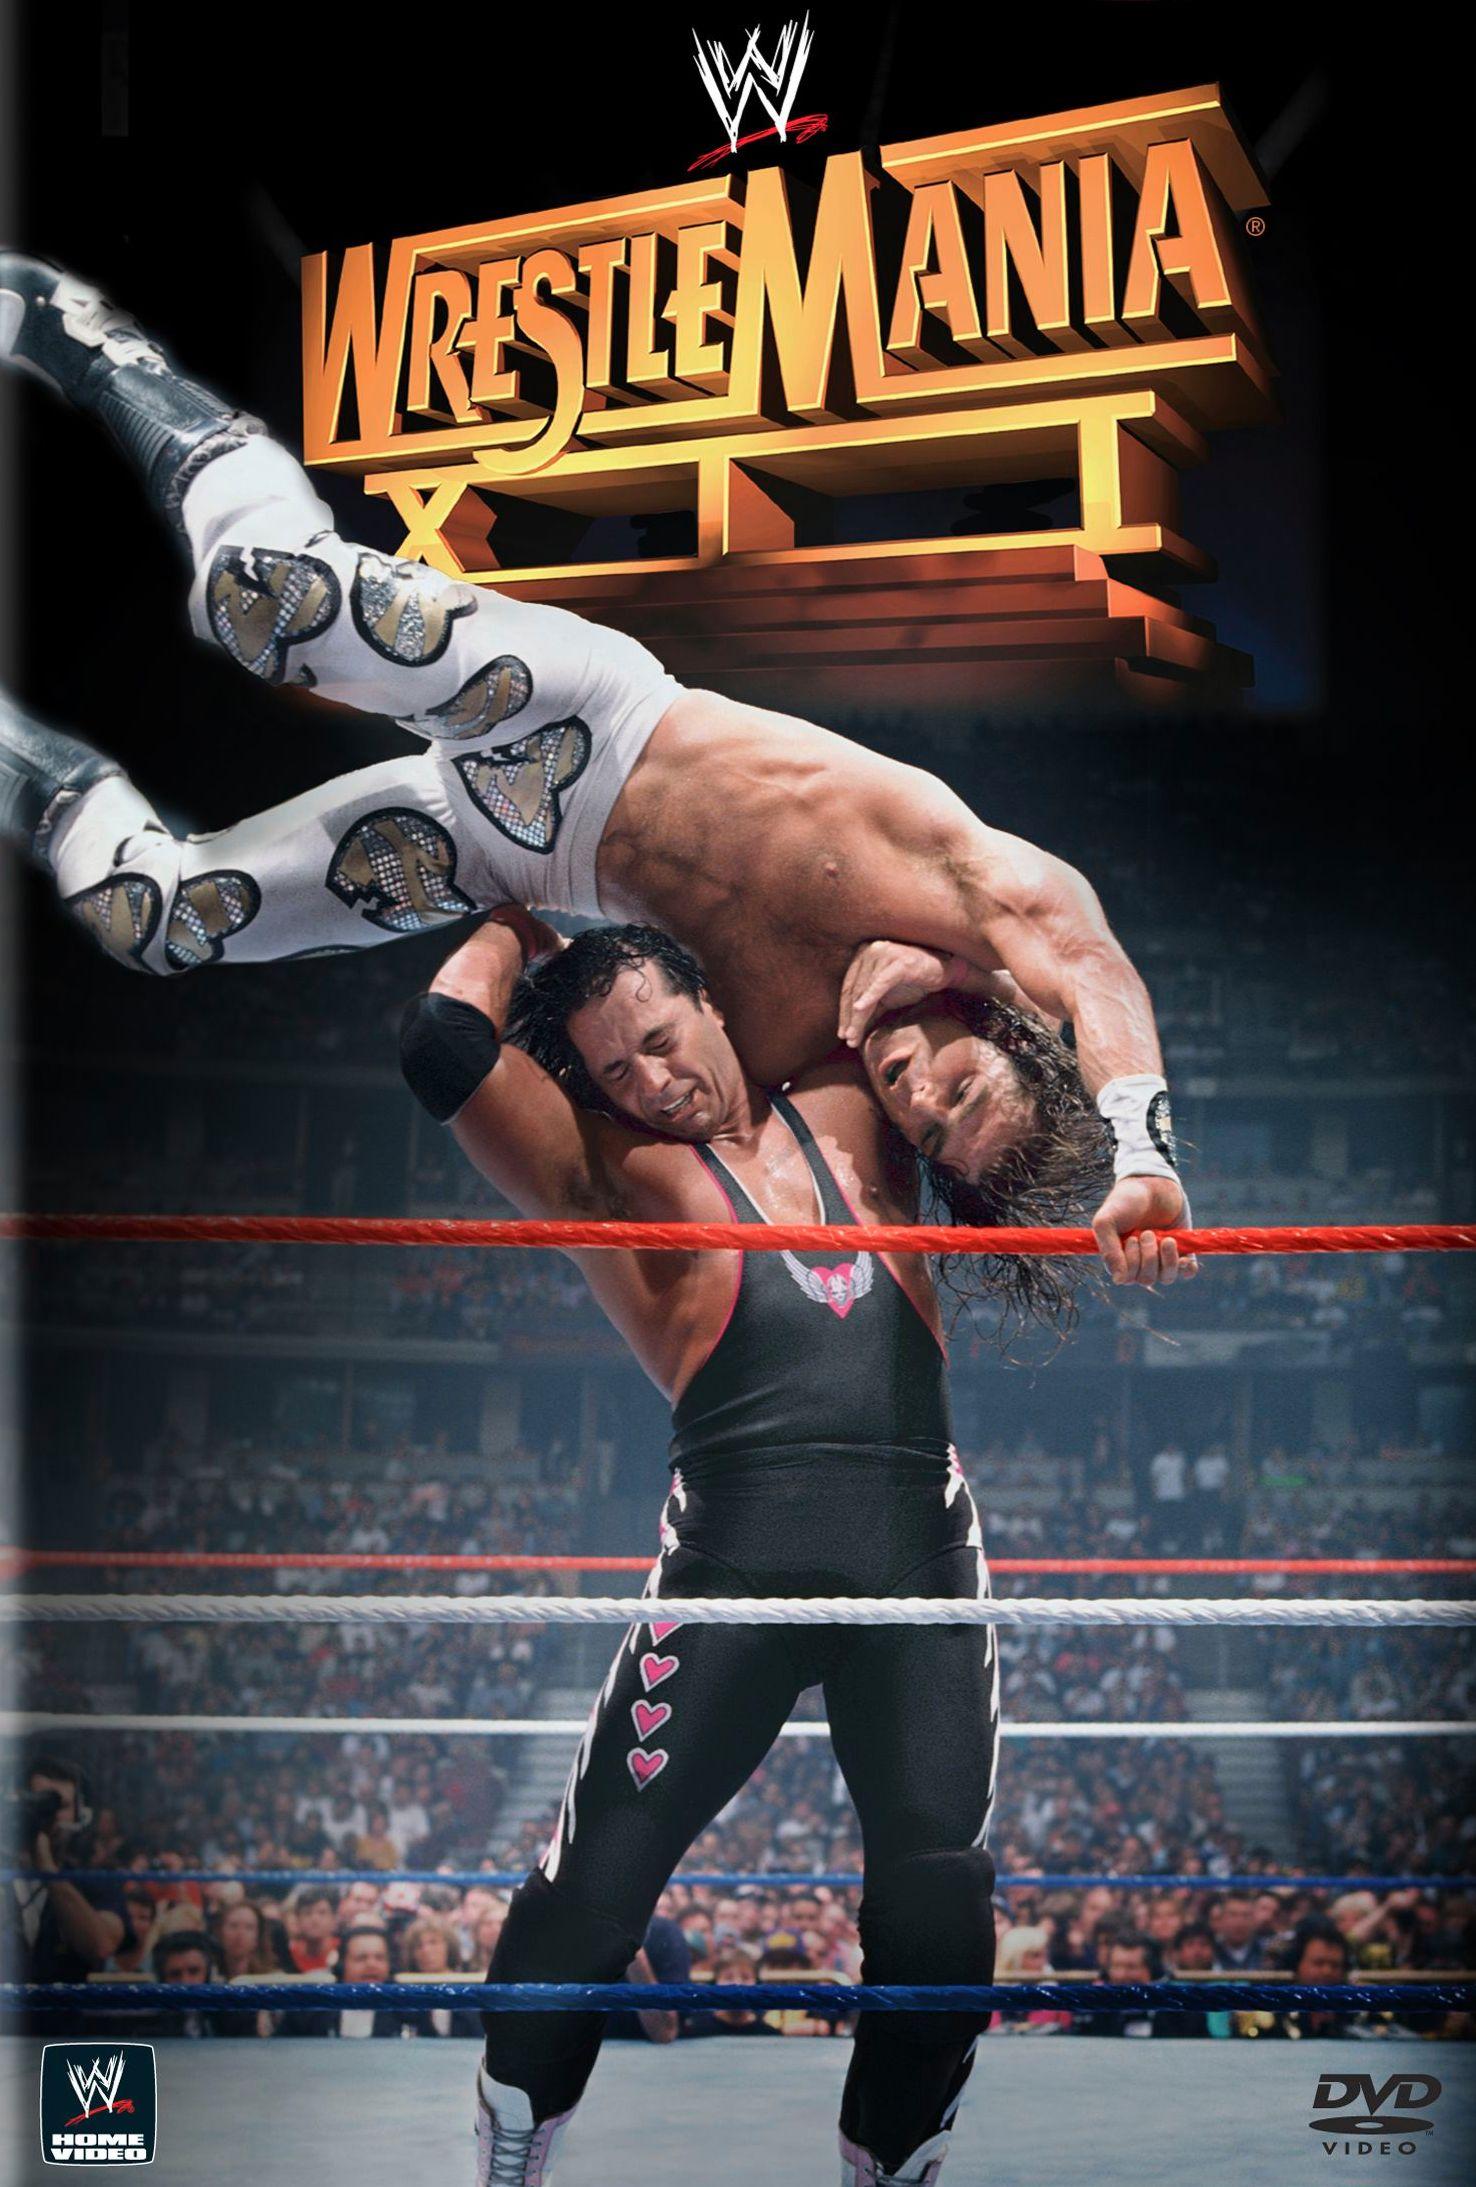 WWE: Wrestlemania XII